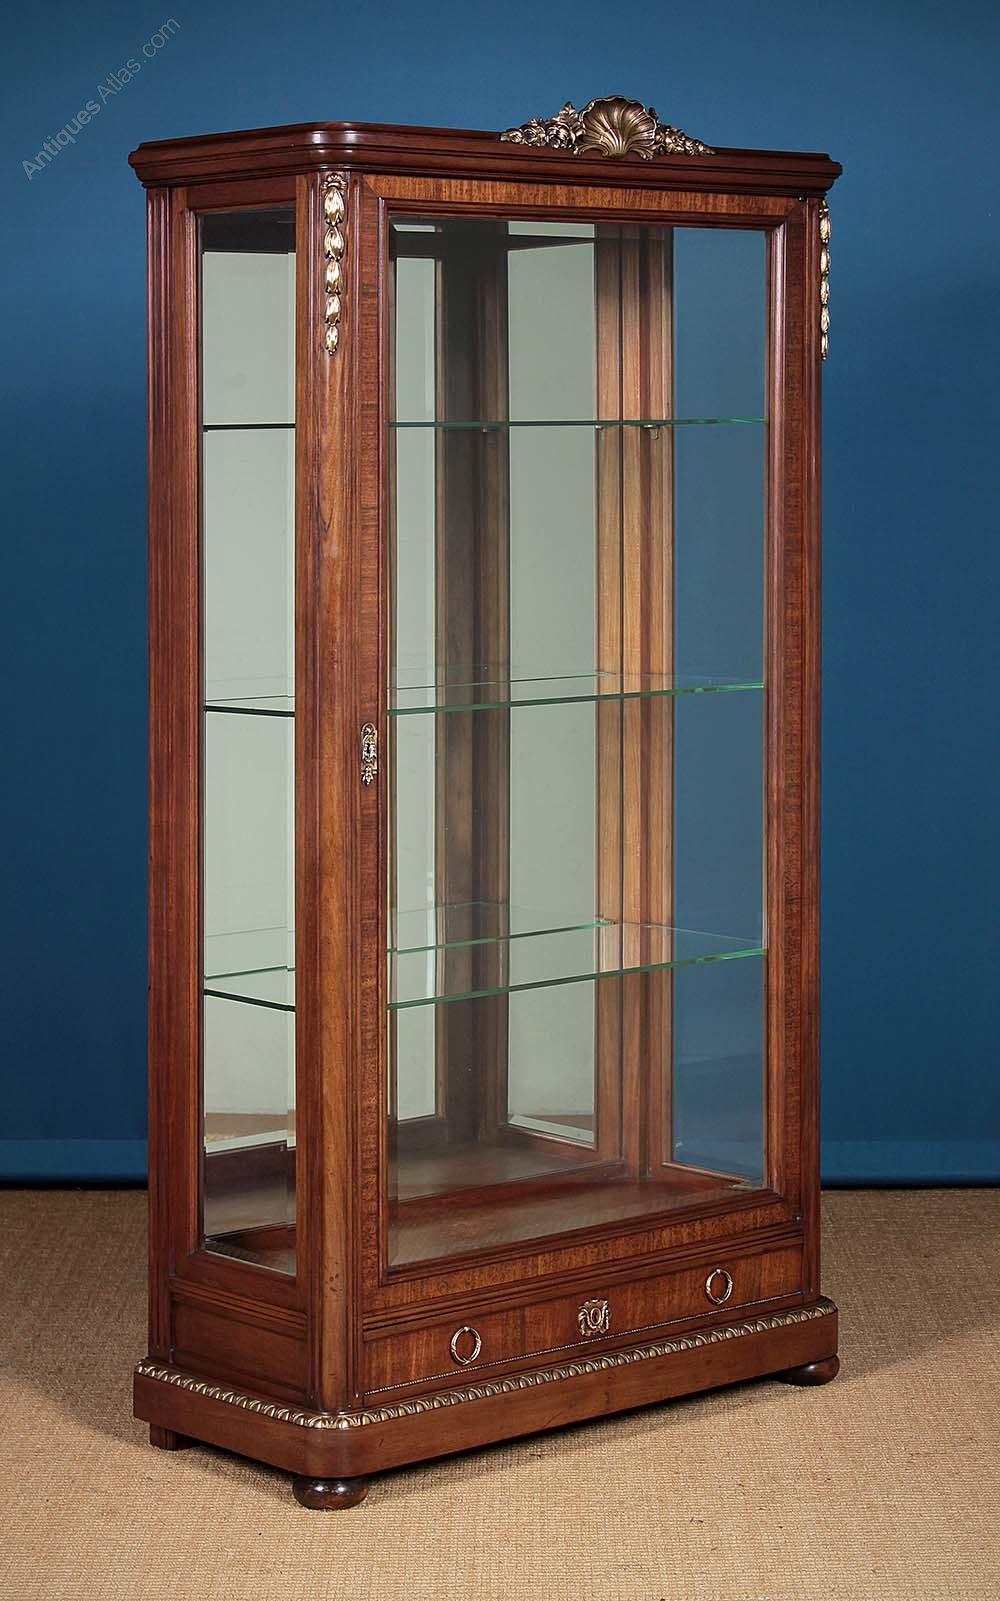 large brass mounted vitrine or display cabinet antiques atlas. Black Bedroom Furniture Sets. Home Design Ideas